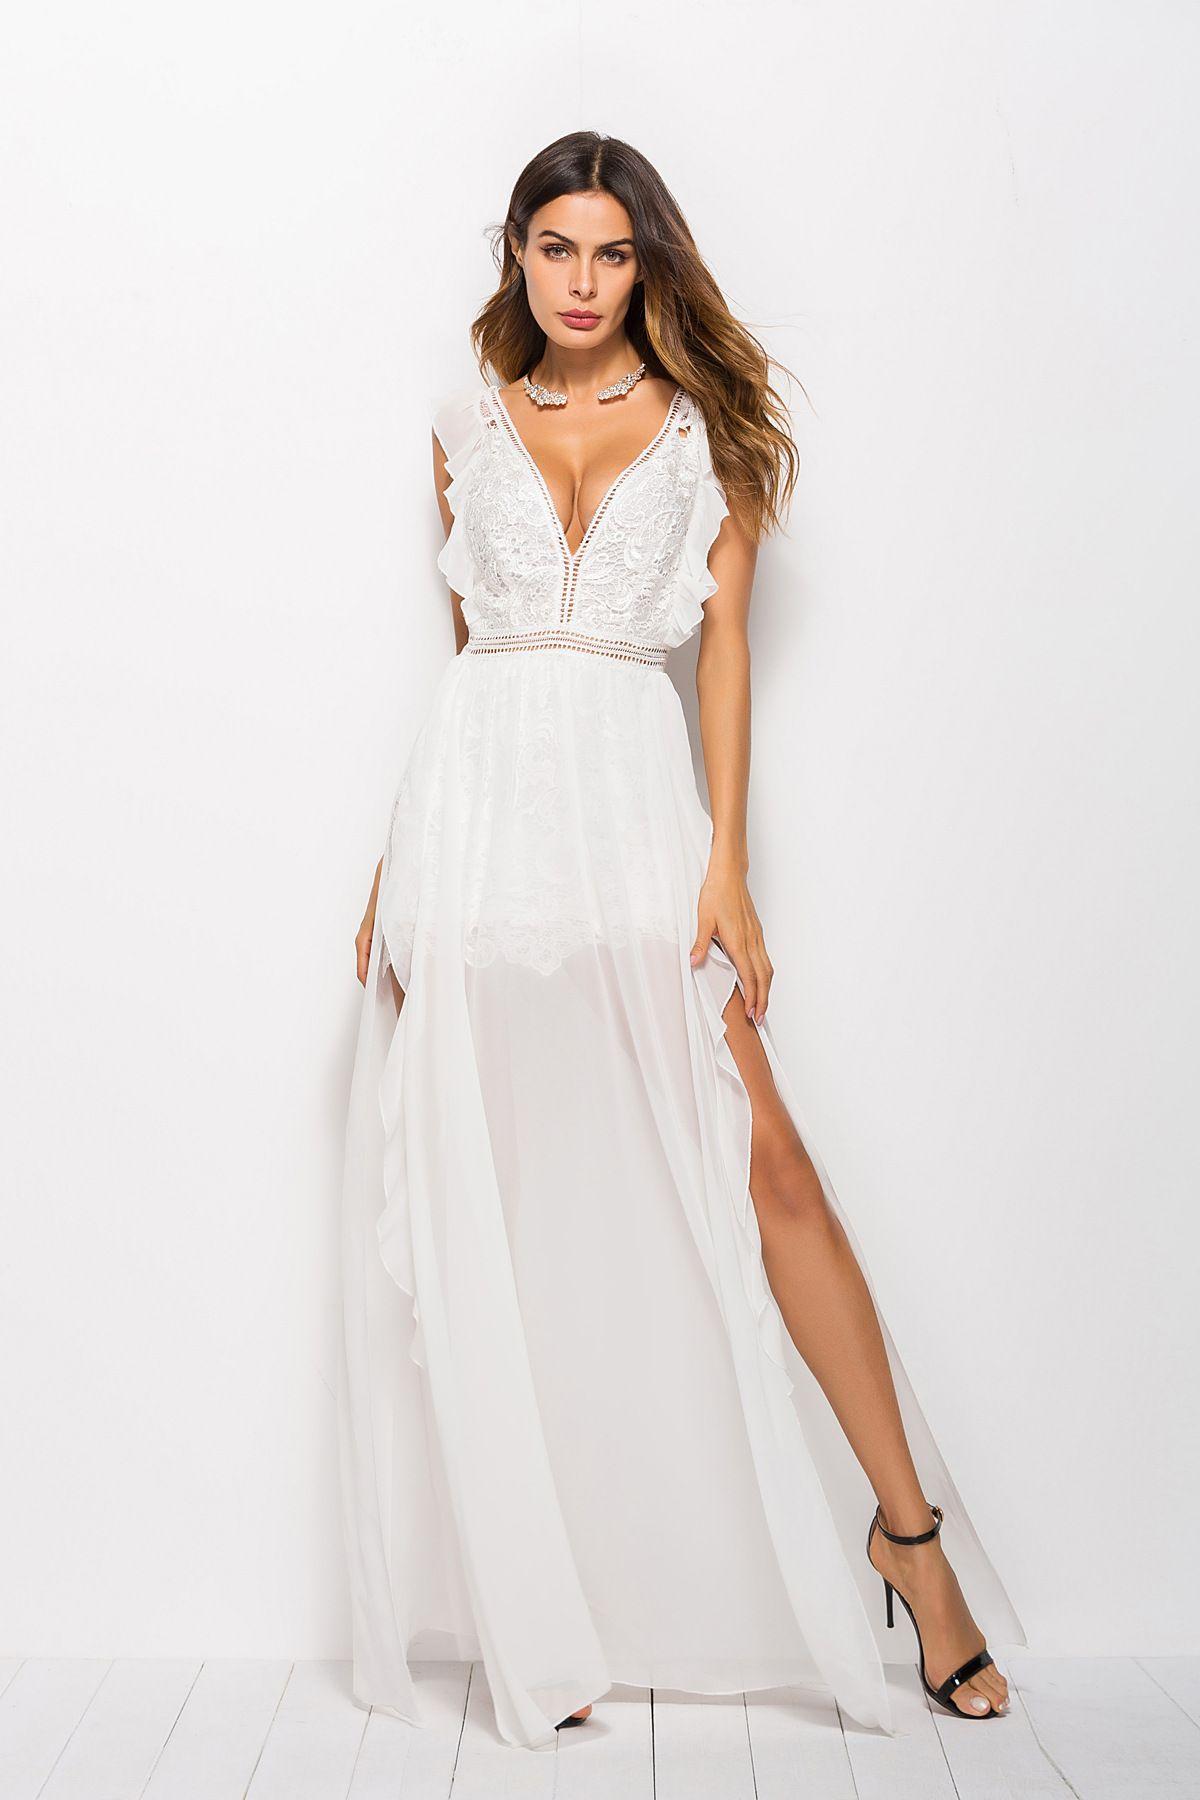 33d22b03e8 2019 Sexy Hollow Out White Lace Dress Women High Split Crochet Chiffon Maxi  Party Dress Ruffle V Neck Elegant Evening Robe Femme From Joycez2820902691,  ...